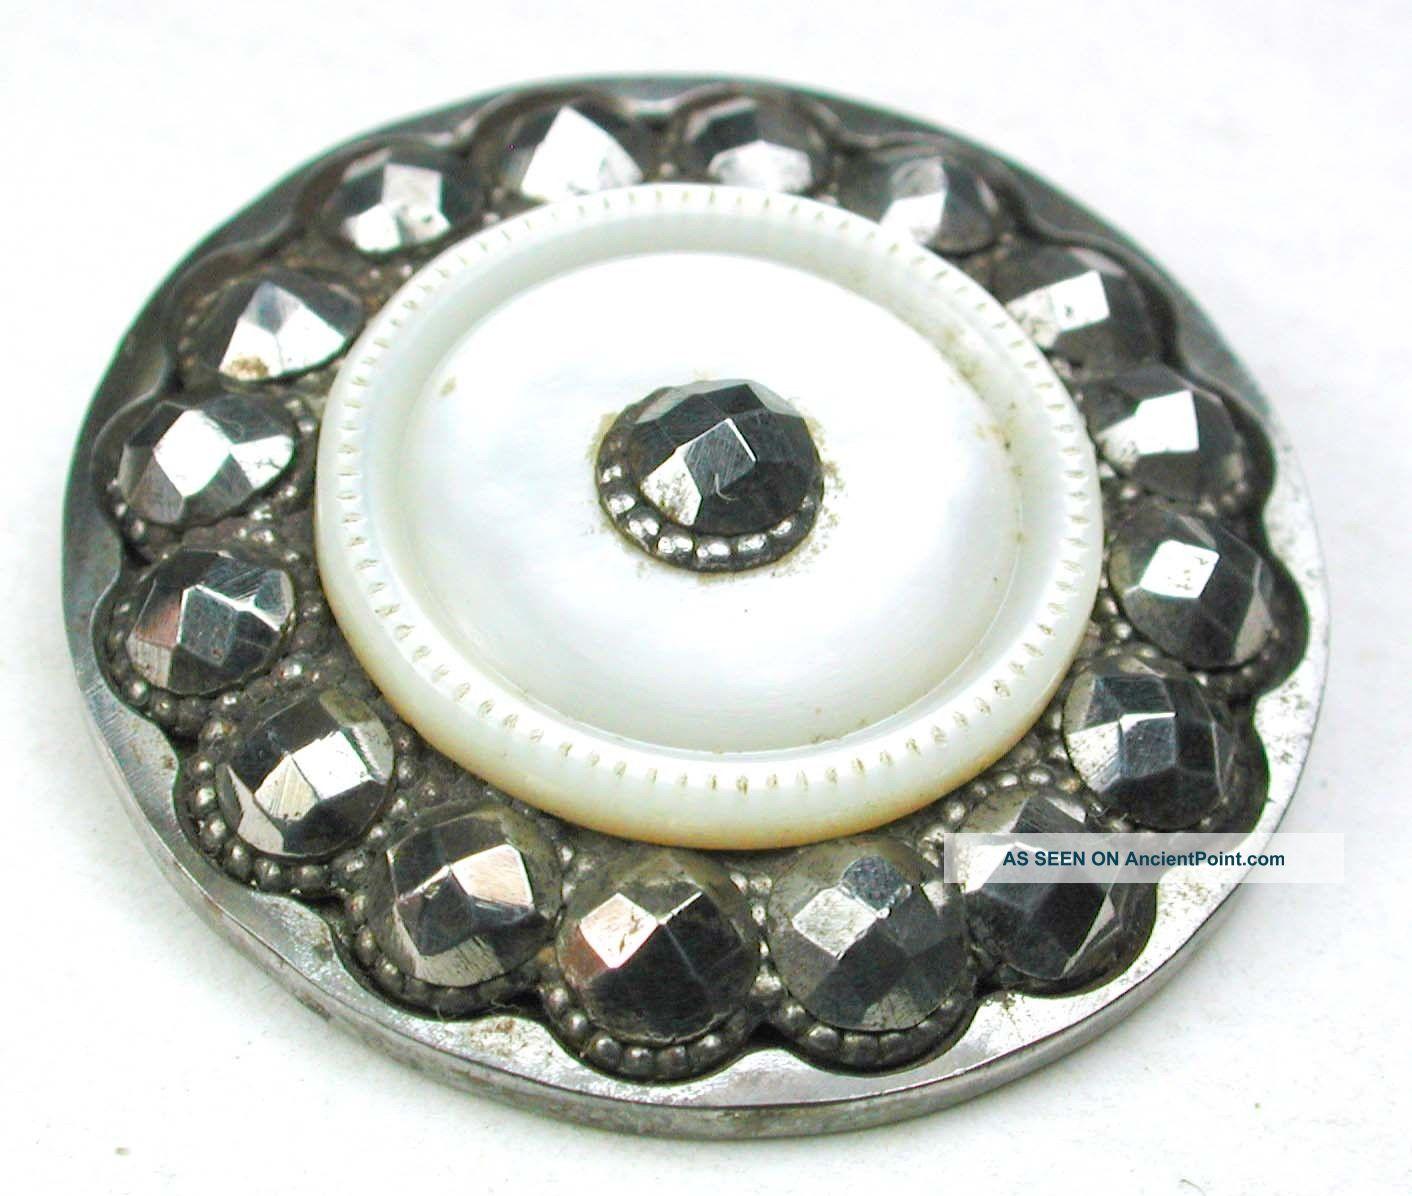 Lg Sz Antique Steel Cup Button Shell Center W/ Cut Steel Border - 1 & 1/4 Buttons photo